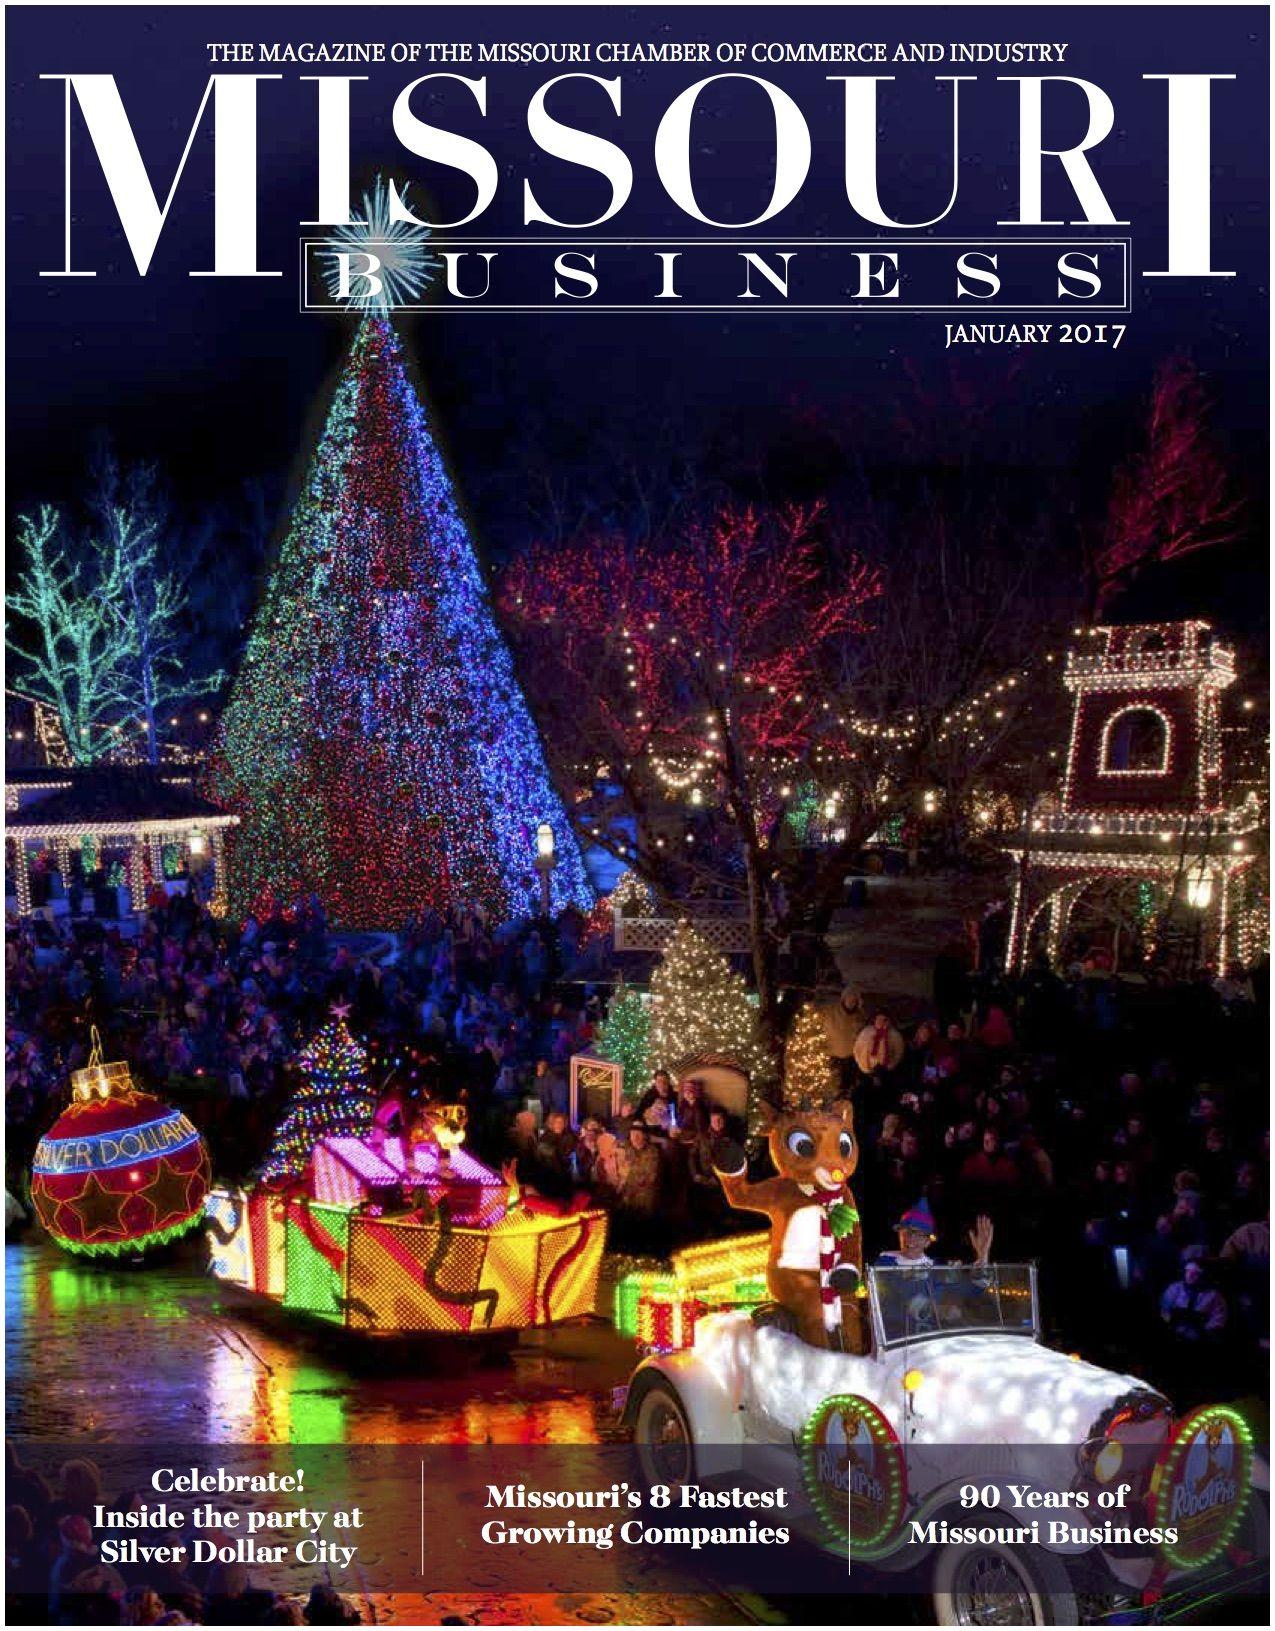 Missouri Business Magazine Staff